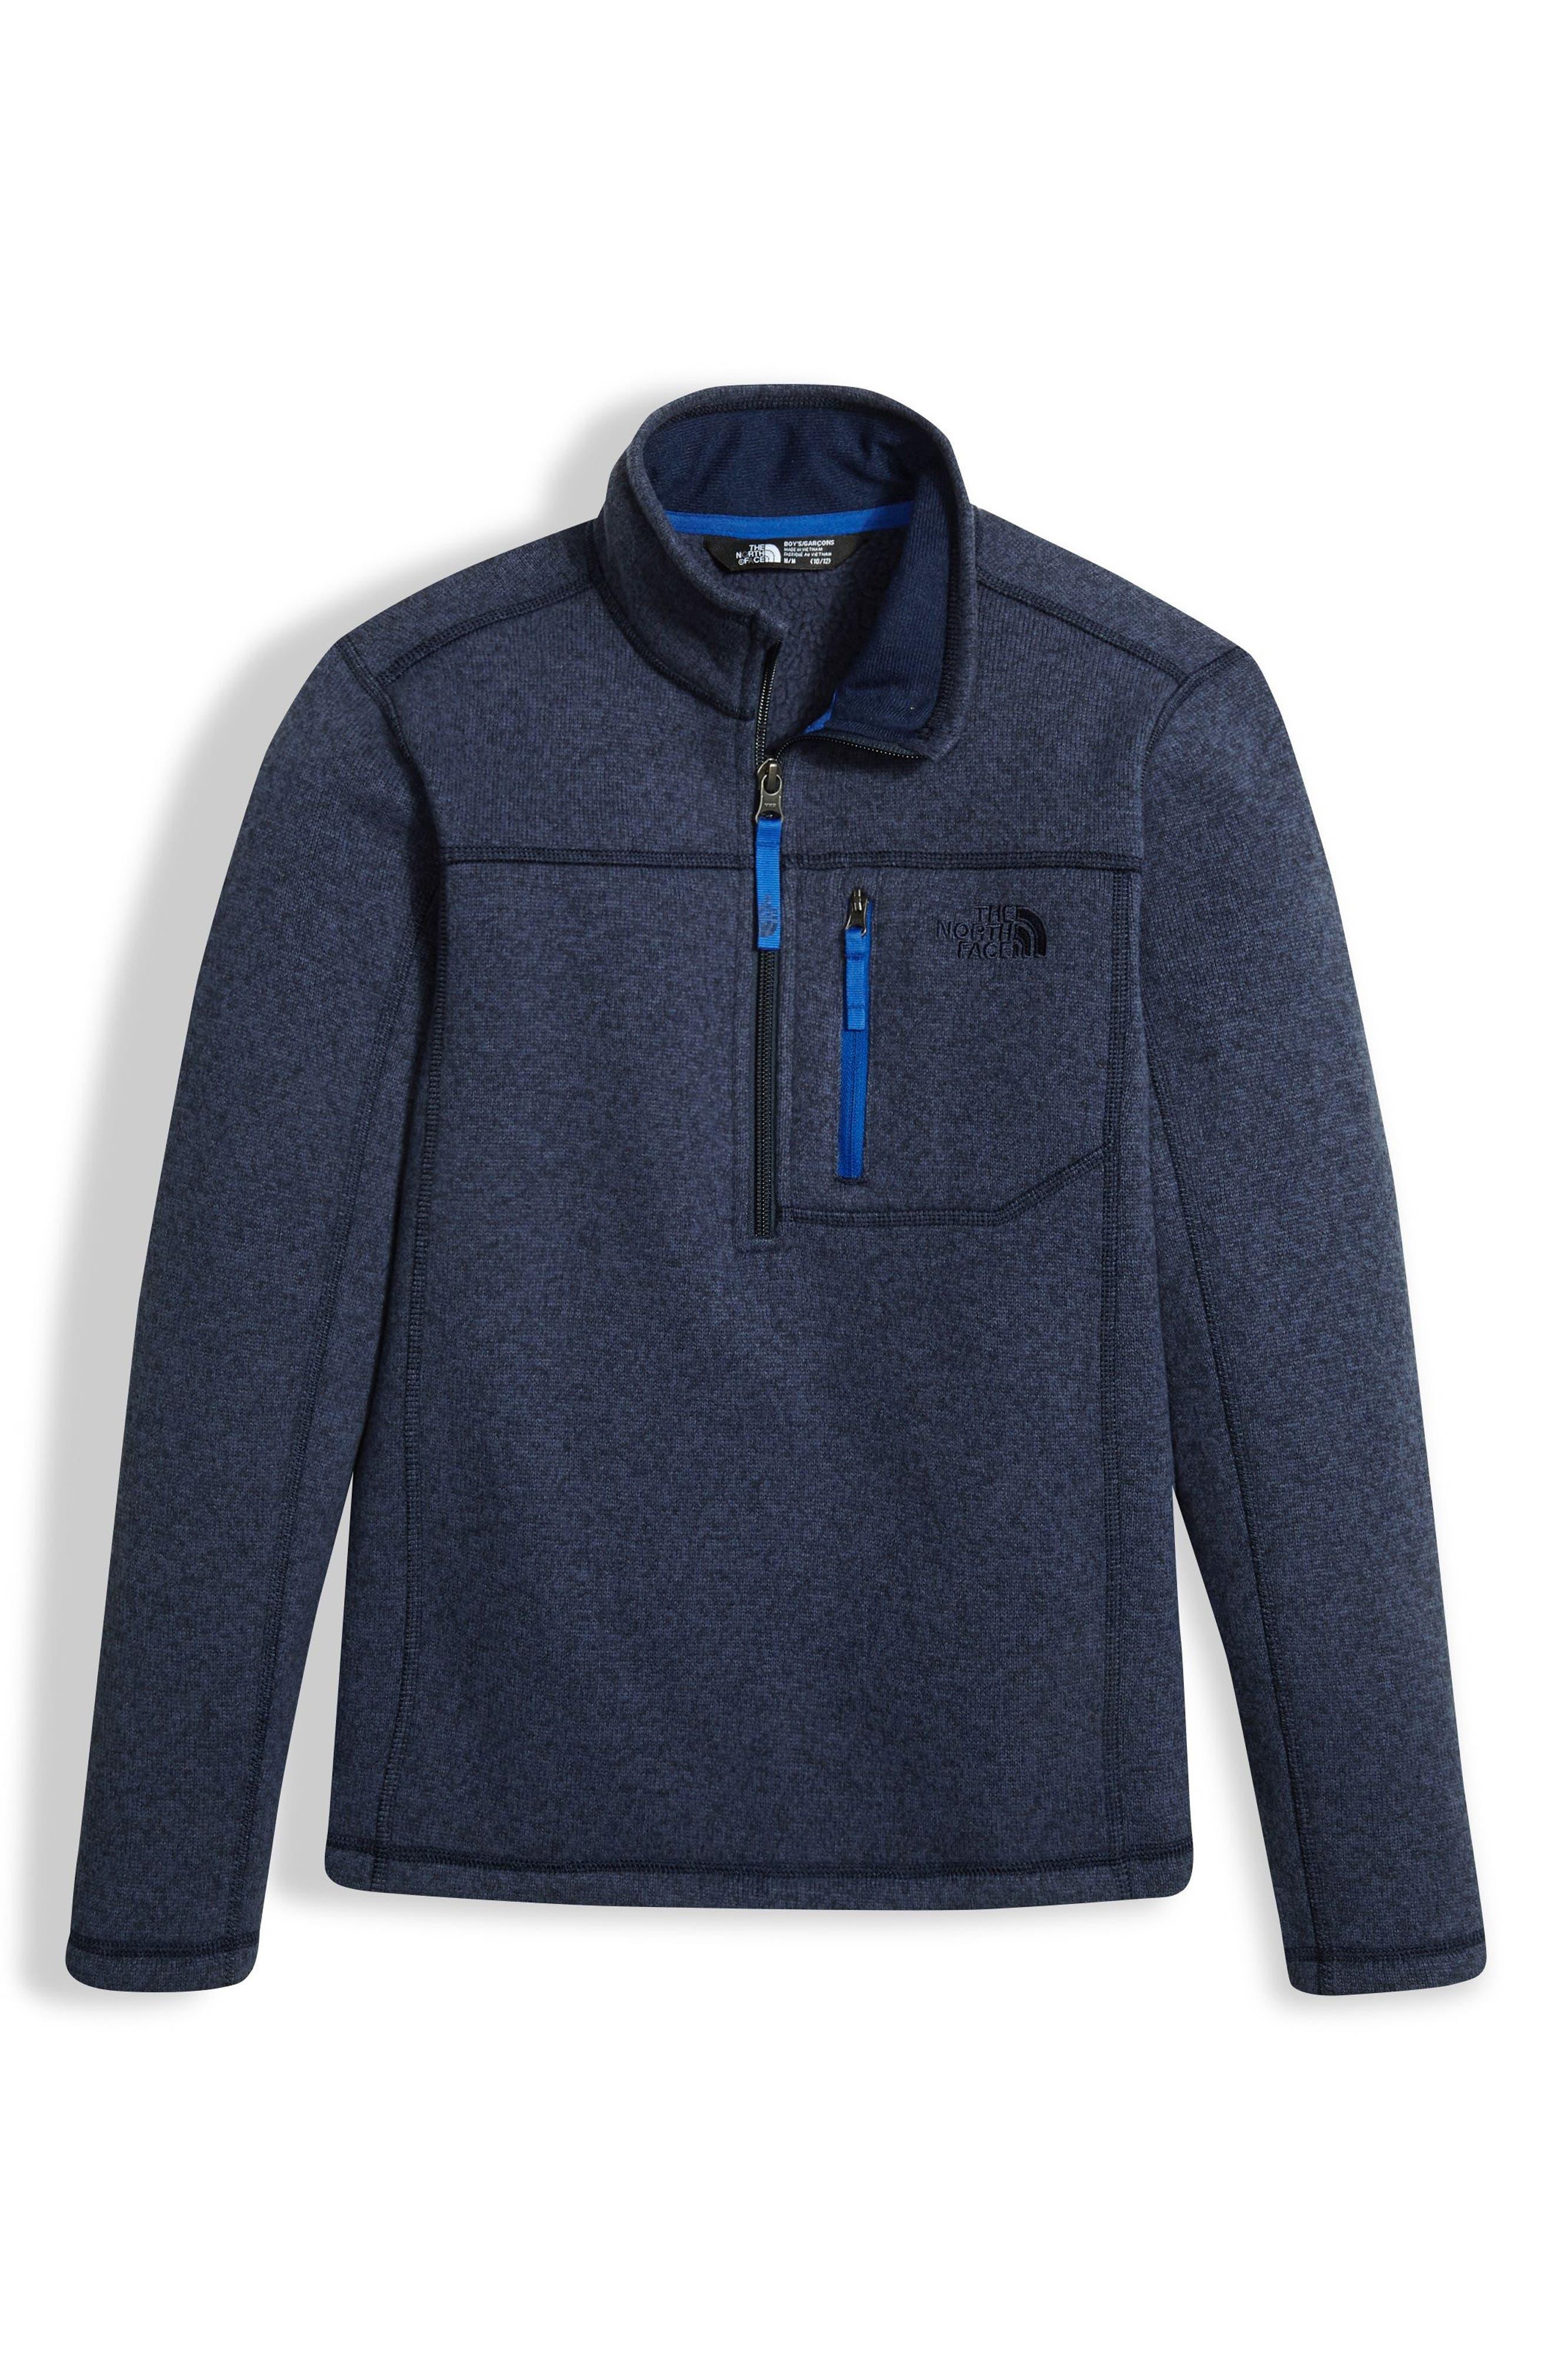 Boys' The North Face Coats, Jackets & Outerwear: Fleece & Parka ...